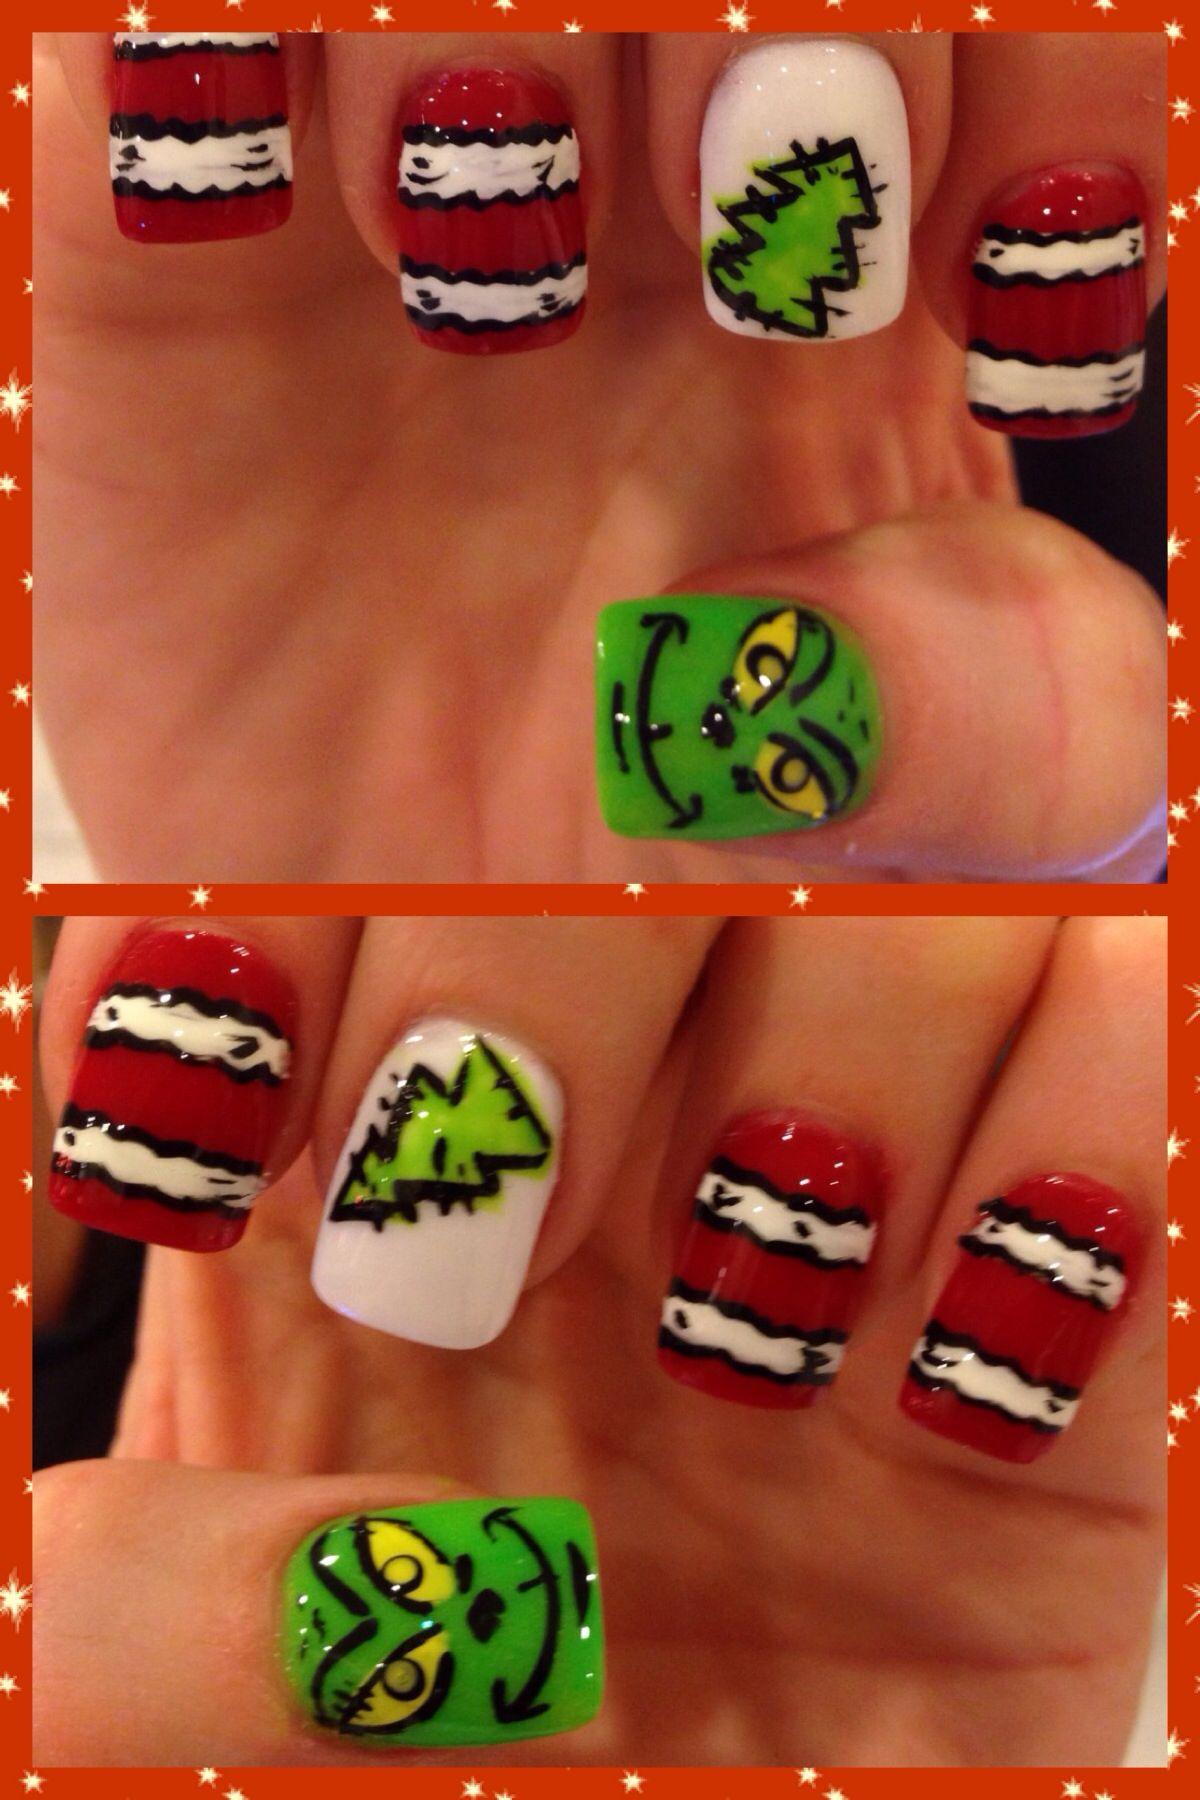 The grinch | Christmas nail designs, Cute acrylic nails ...